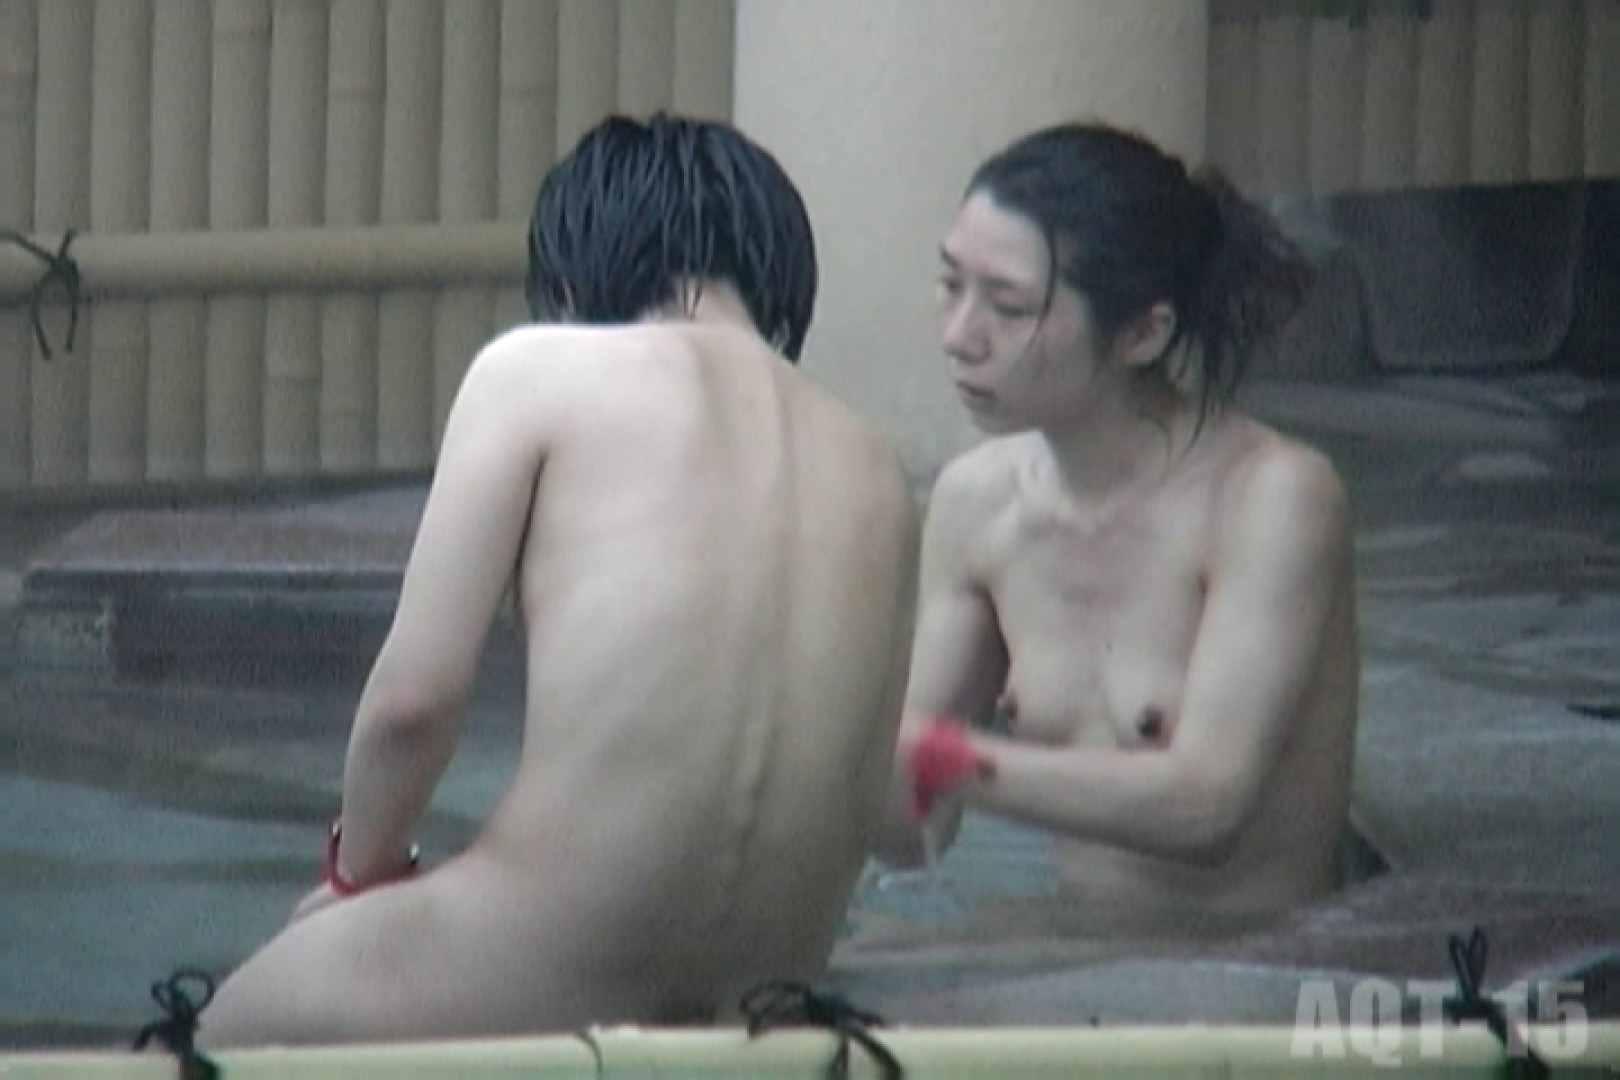 Aquaな露天風呂Vol.837 盗撮映像  107Pix 107